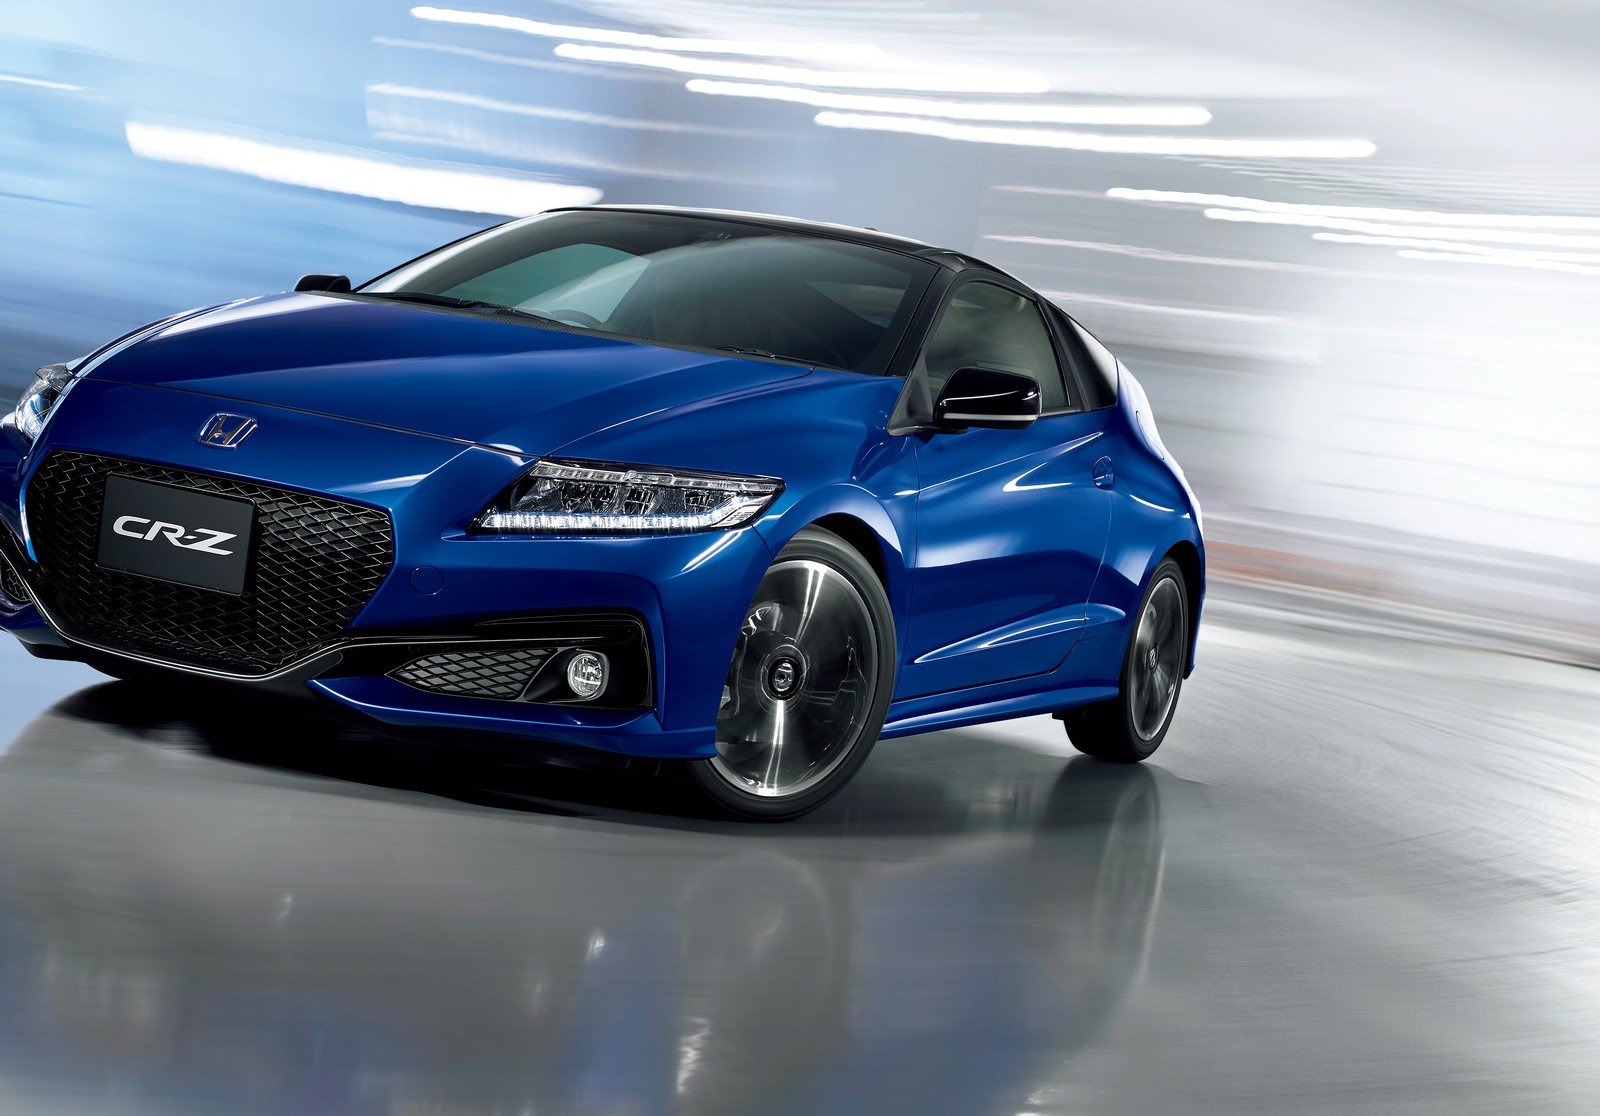 honda cr  facelift unveiled pakwheels blog